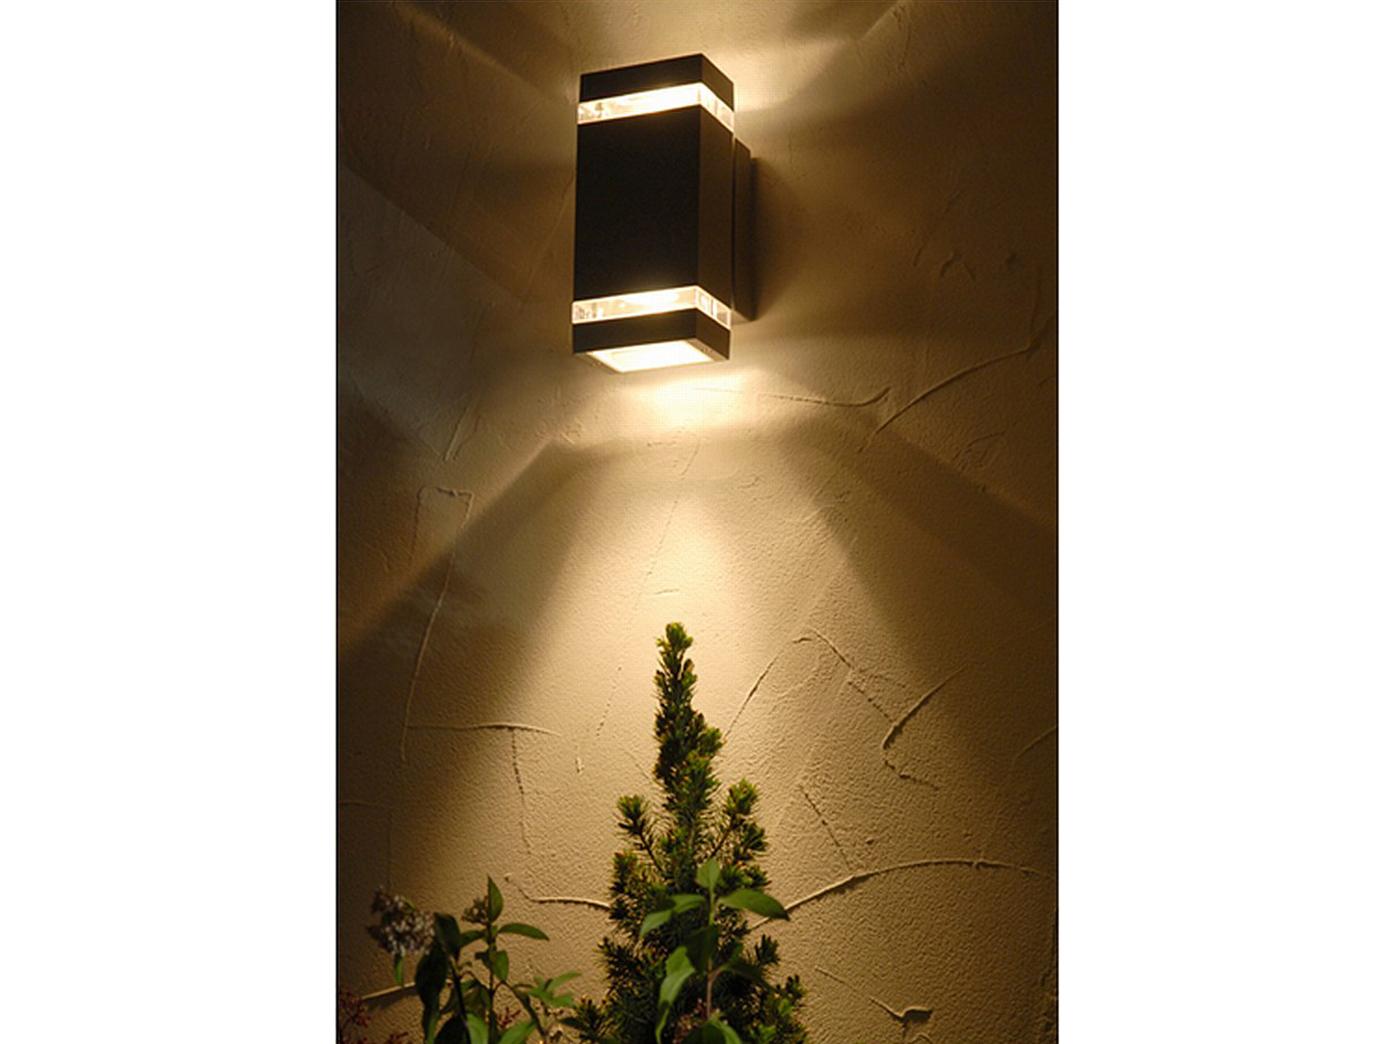 2 wandleuchten au en eckig up downlight led aluminiumguss au enleuchte ebay. Black Bedroom Furniture Sets. Home Design Ideas